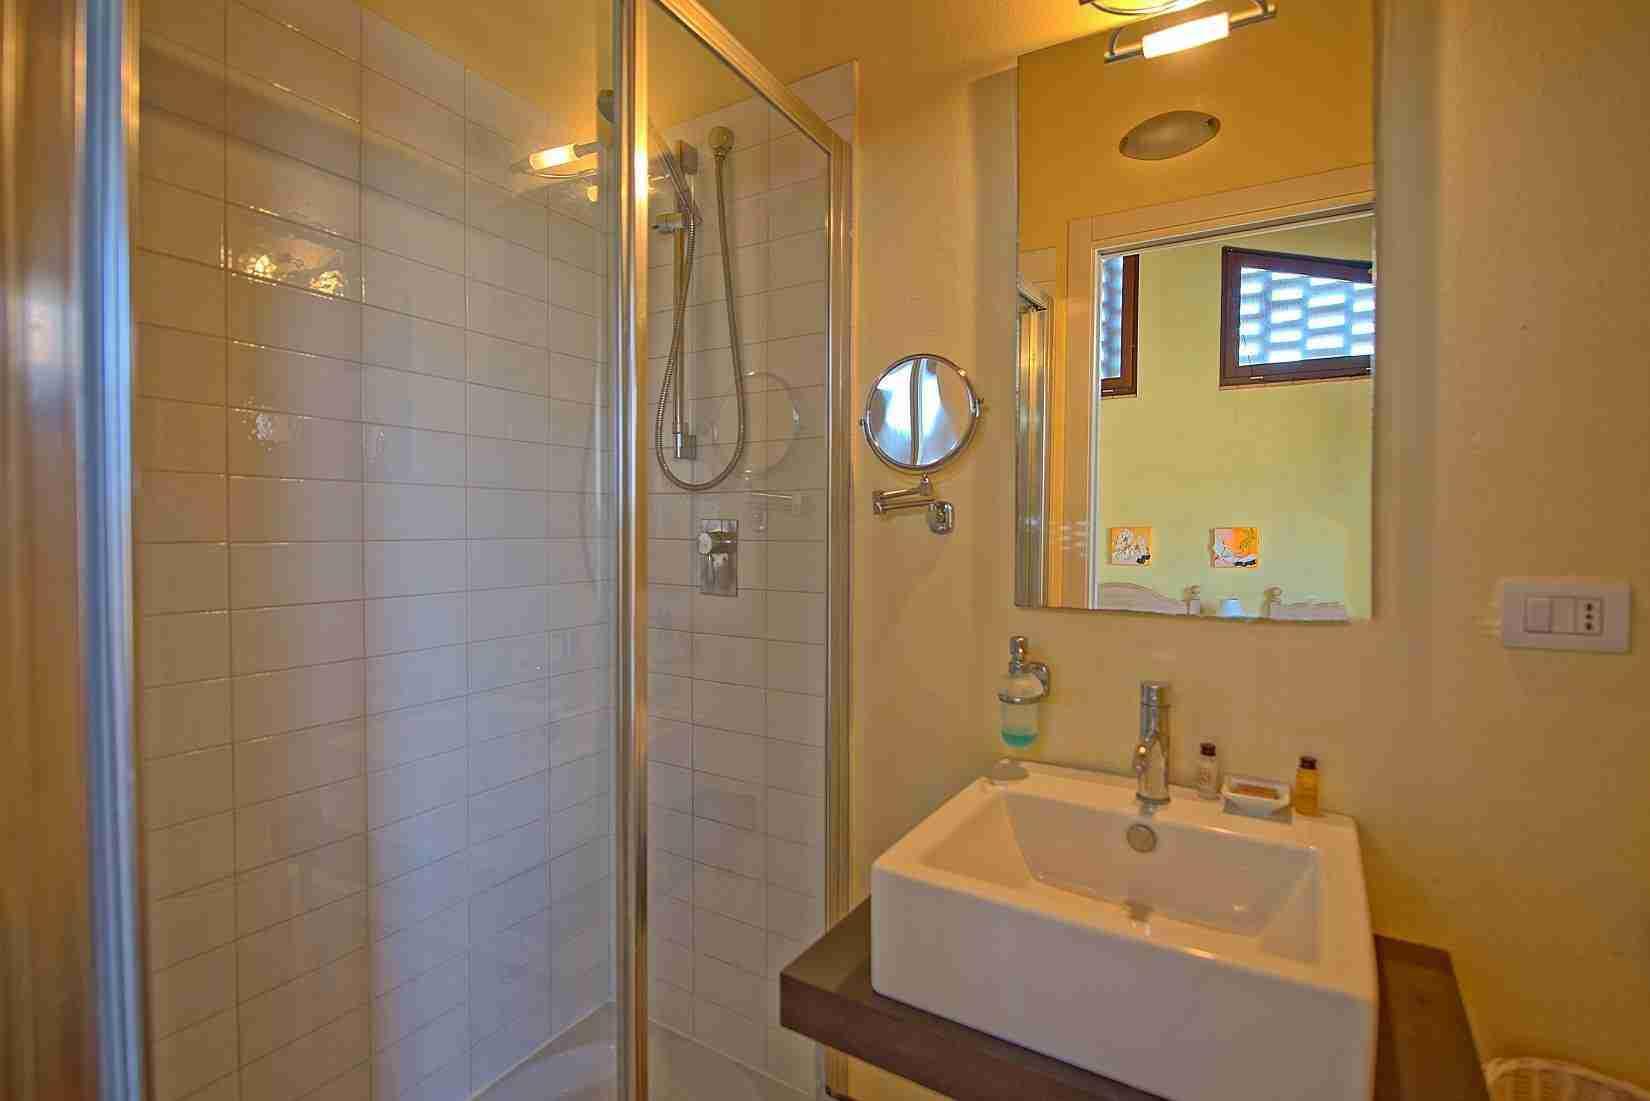 13 Ranieri bathroom